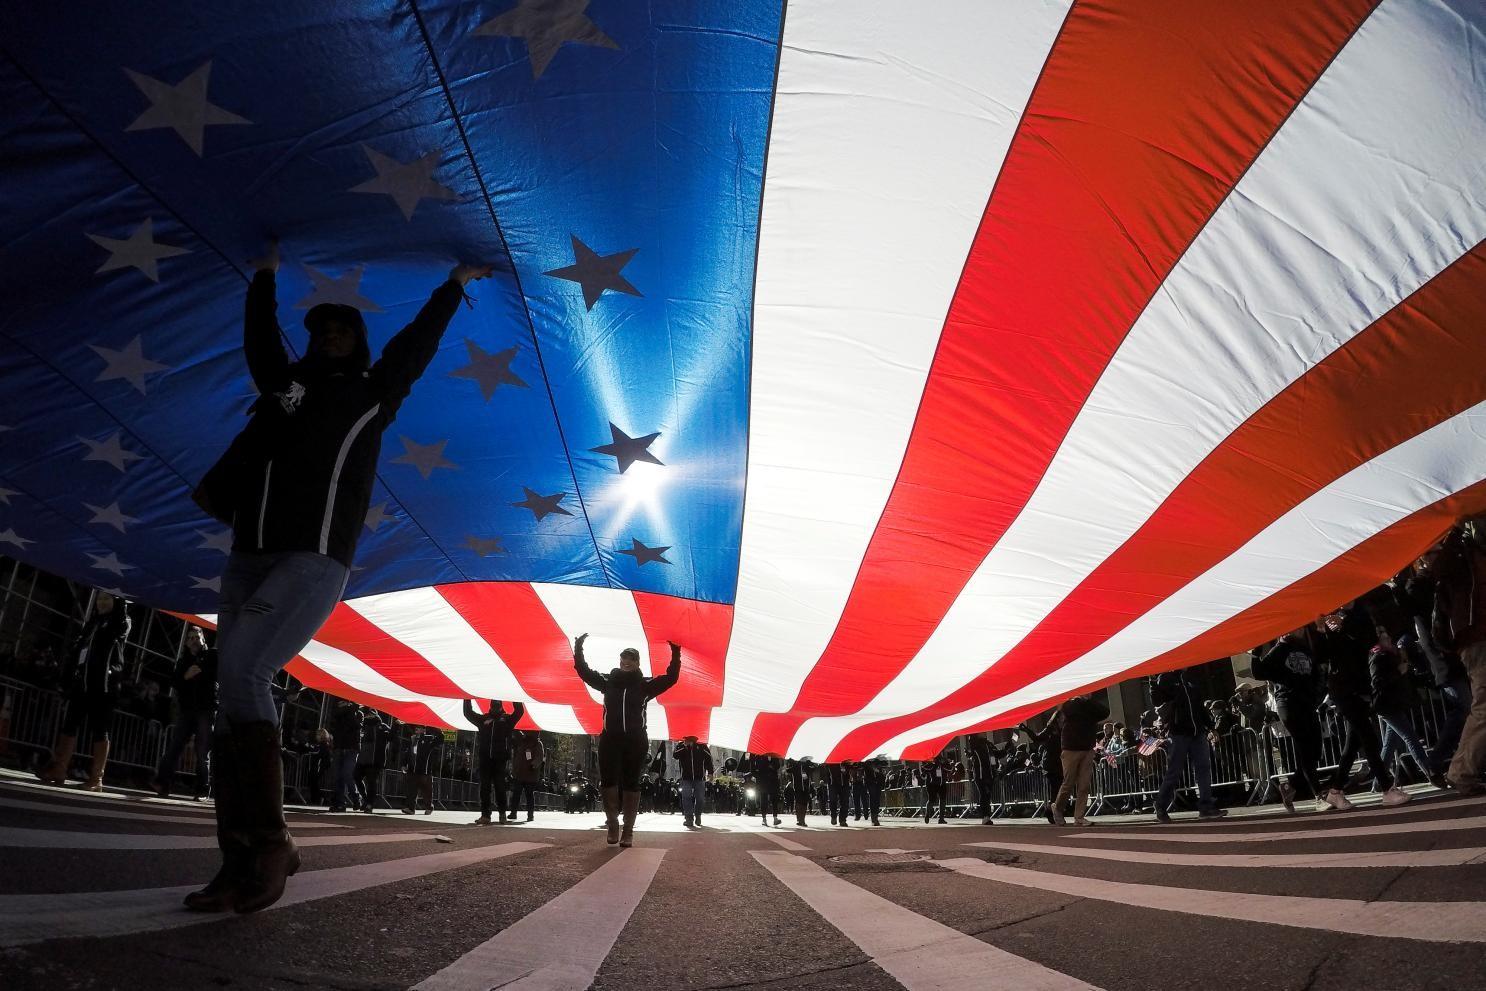 American flags - 1